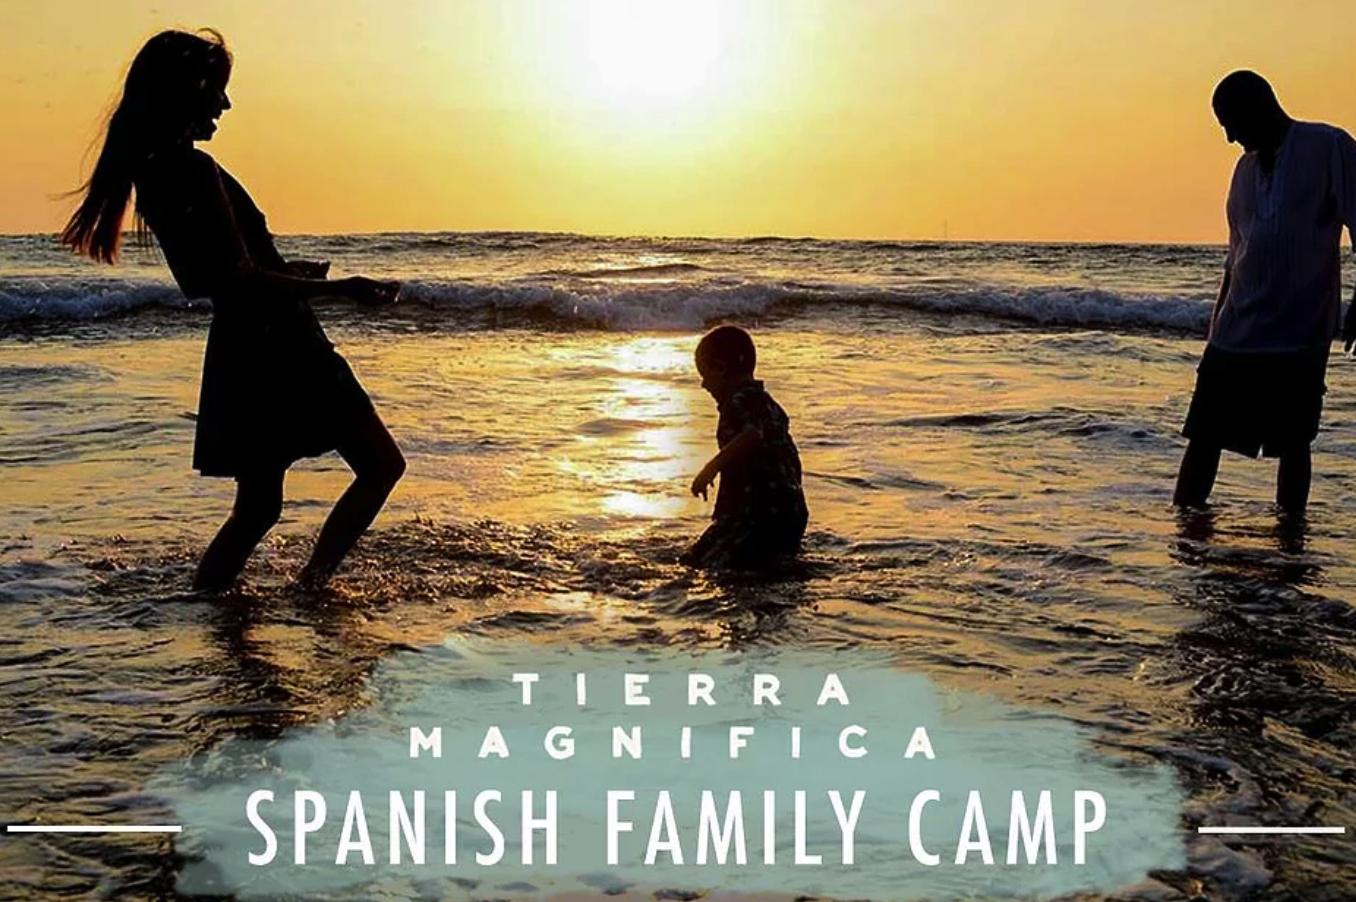 SPANISH FAMILY CAMP